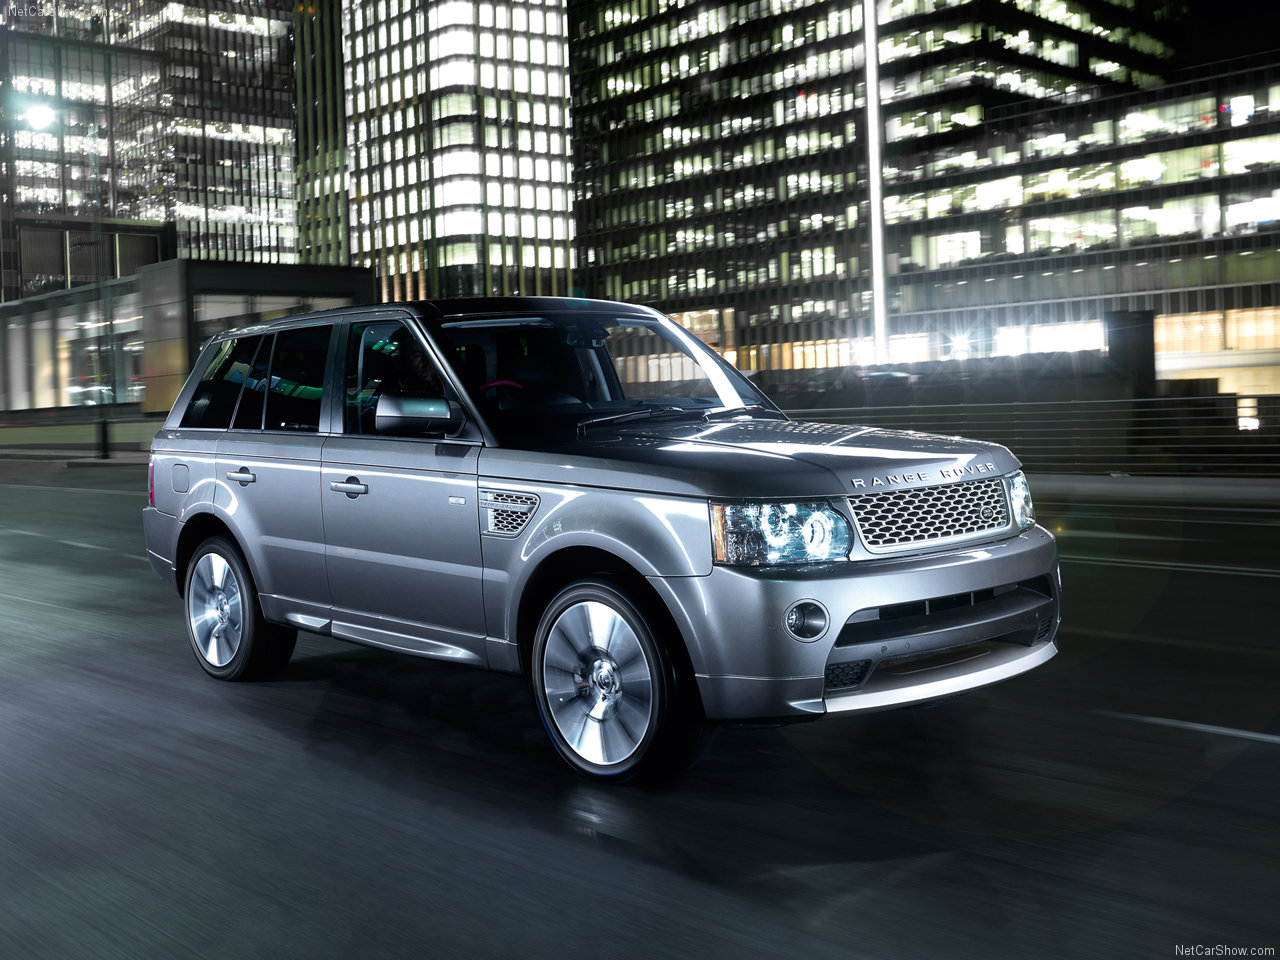 Range Rover Autobiography 2010 >> net drifting: Todoterrenos